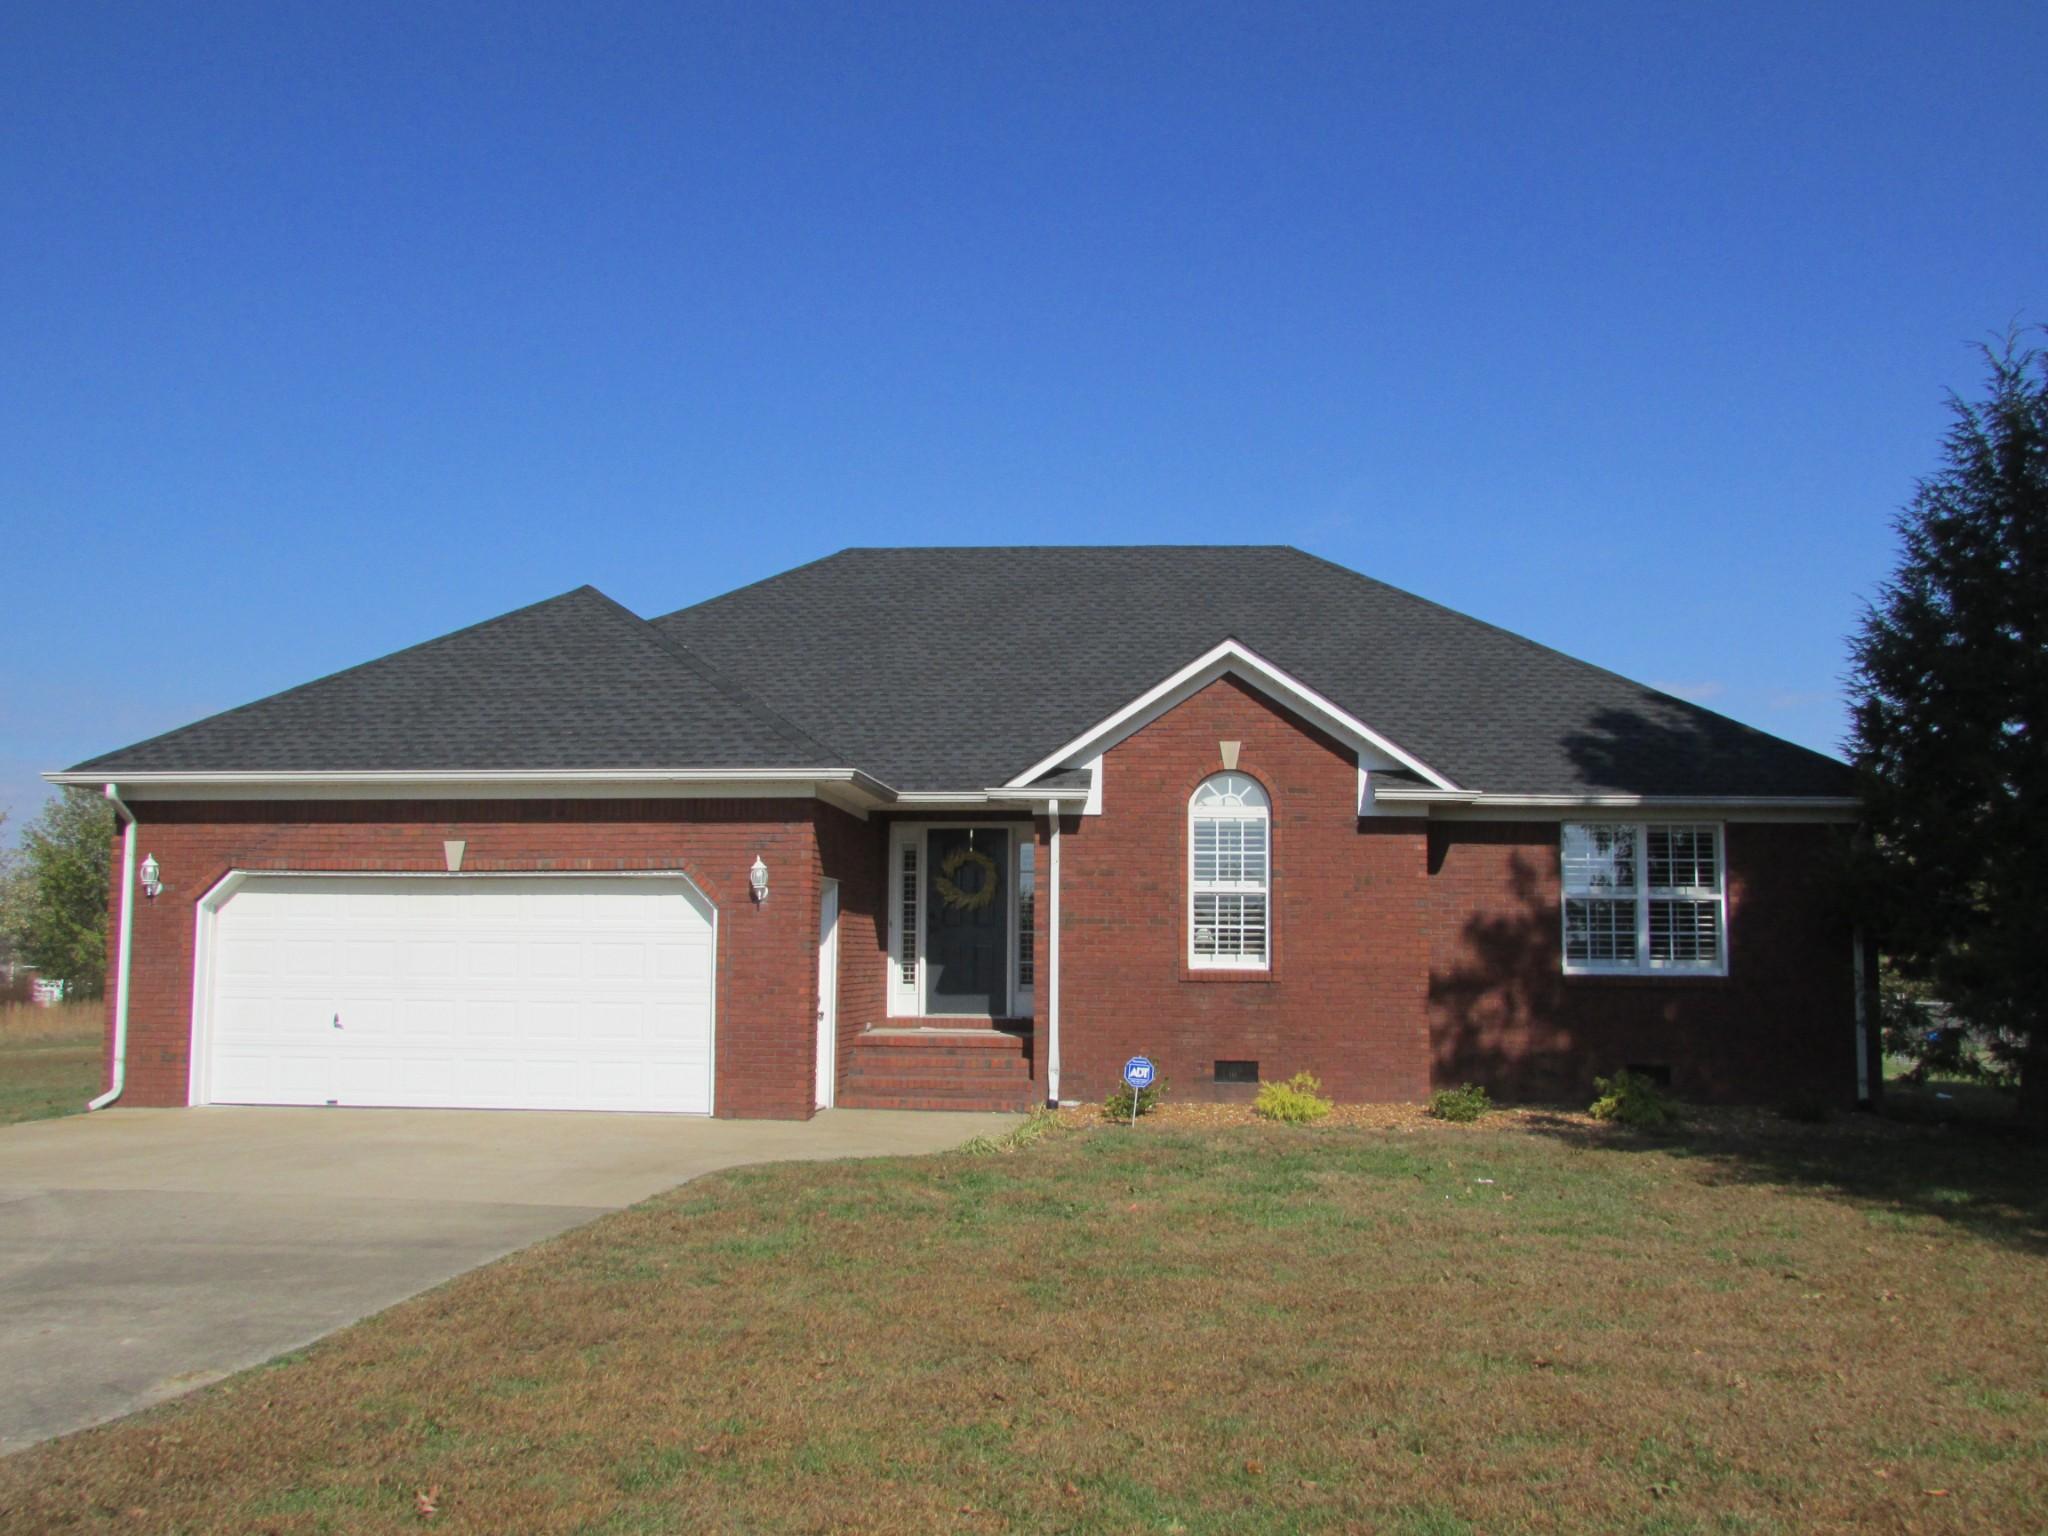 201 Balee Dr, Ethridge, TN 38456 - Ethridge, TN real estate listing